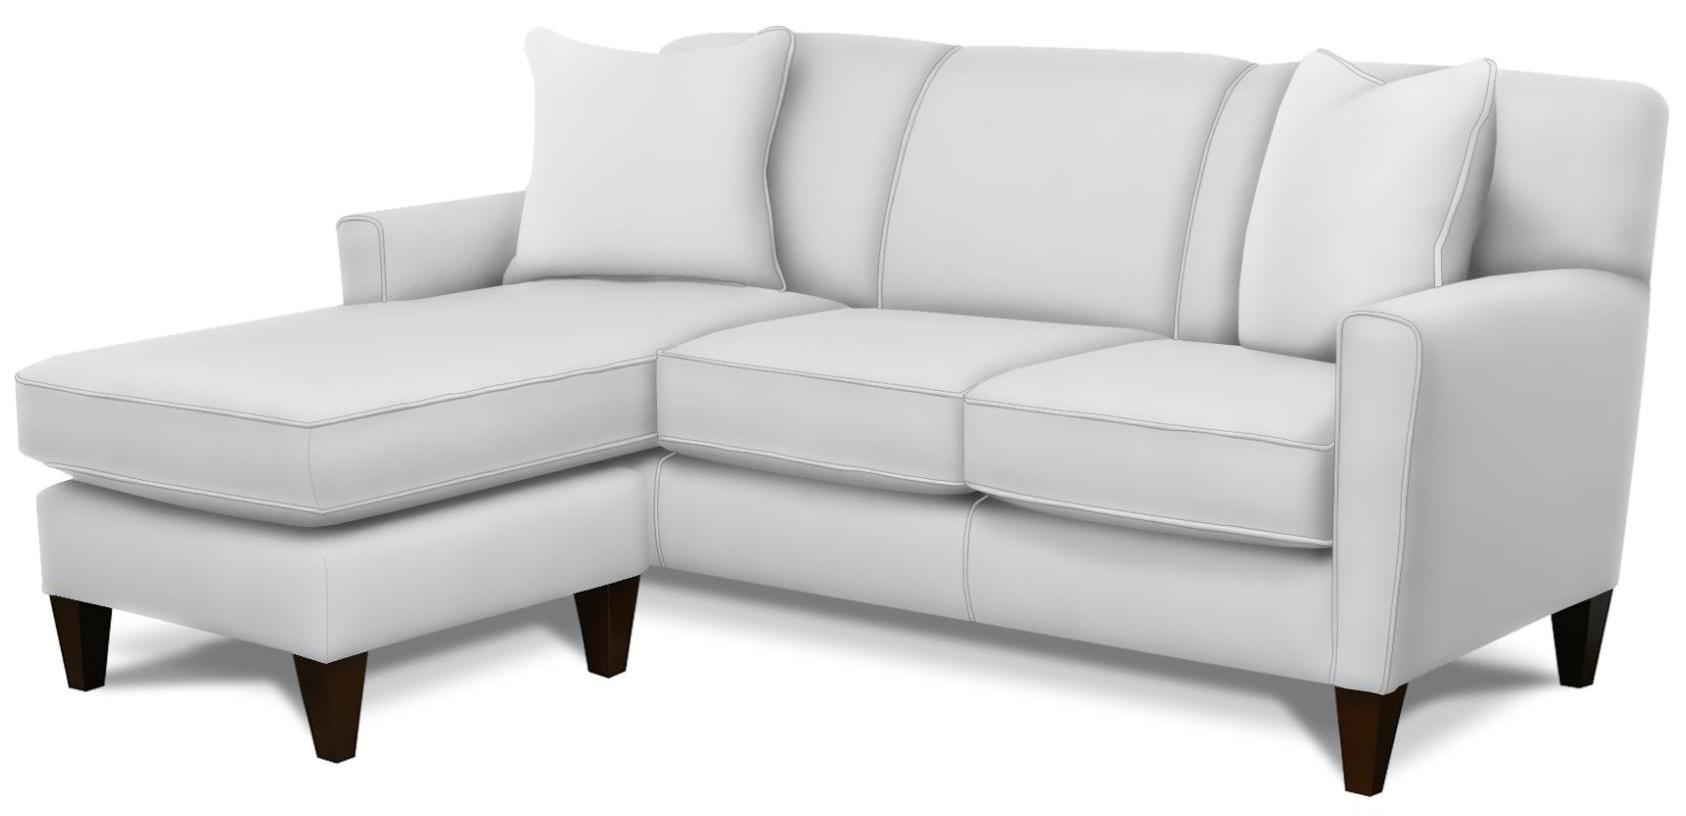 Floating Ottoman Chaise Sofa